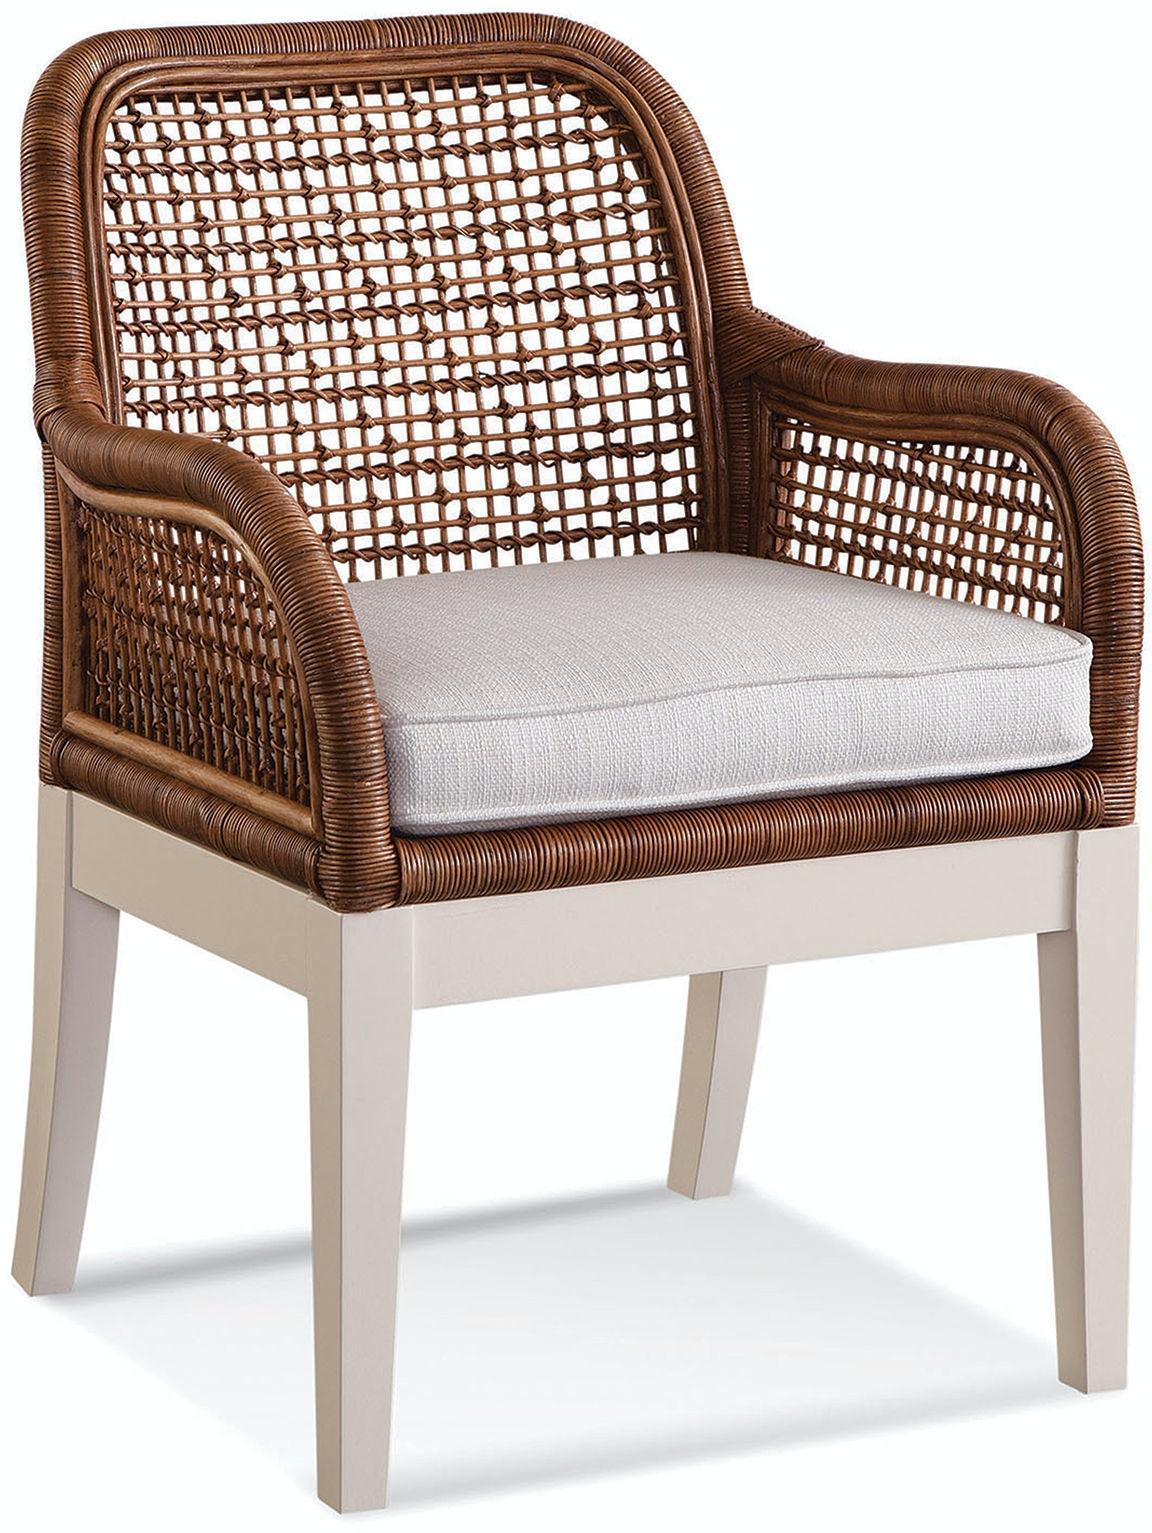 Braxton Culler Dining Room Dining Chair 1017 029 Zing